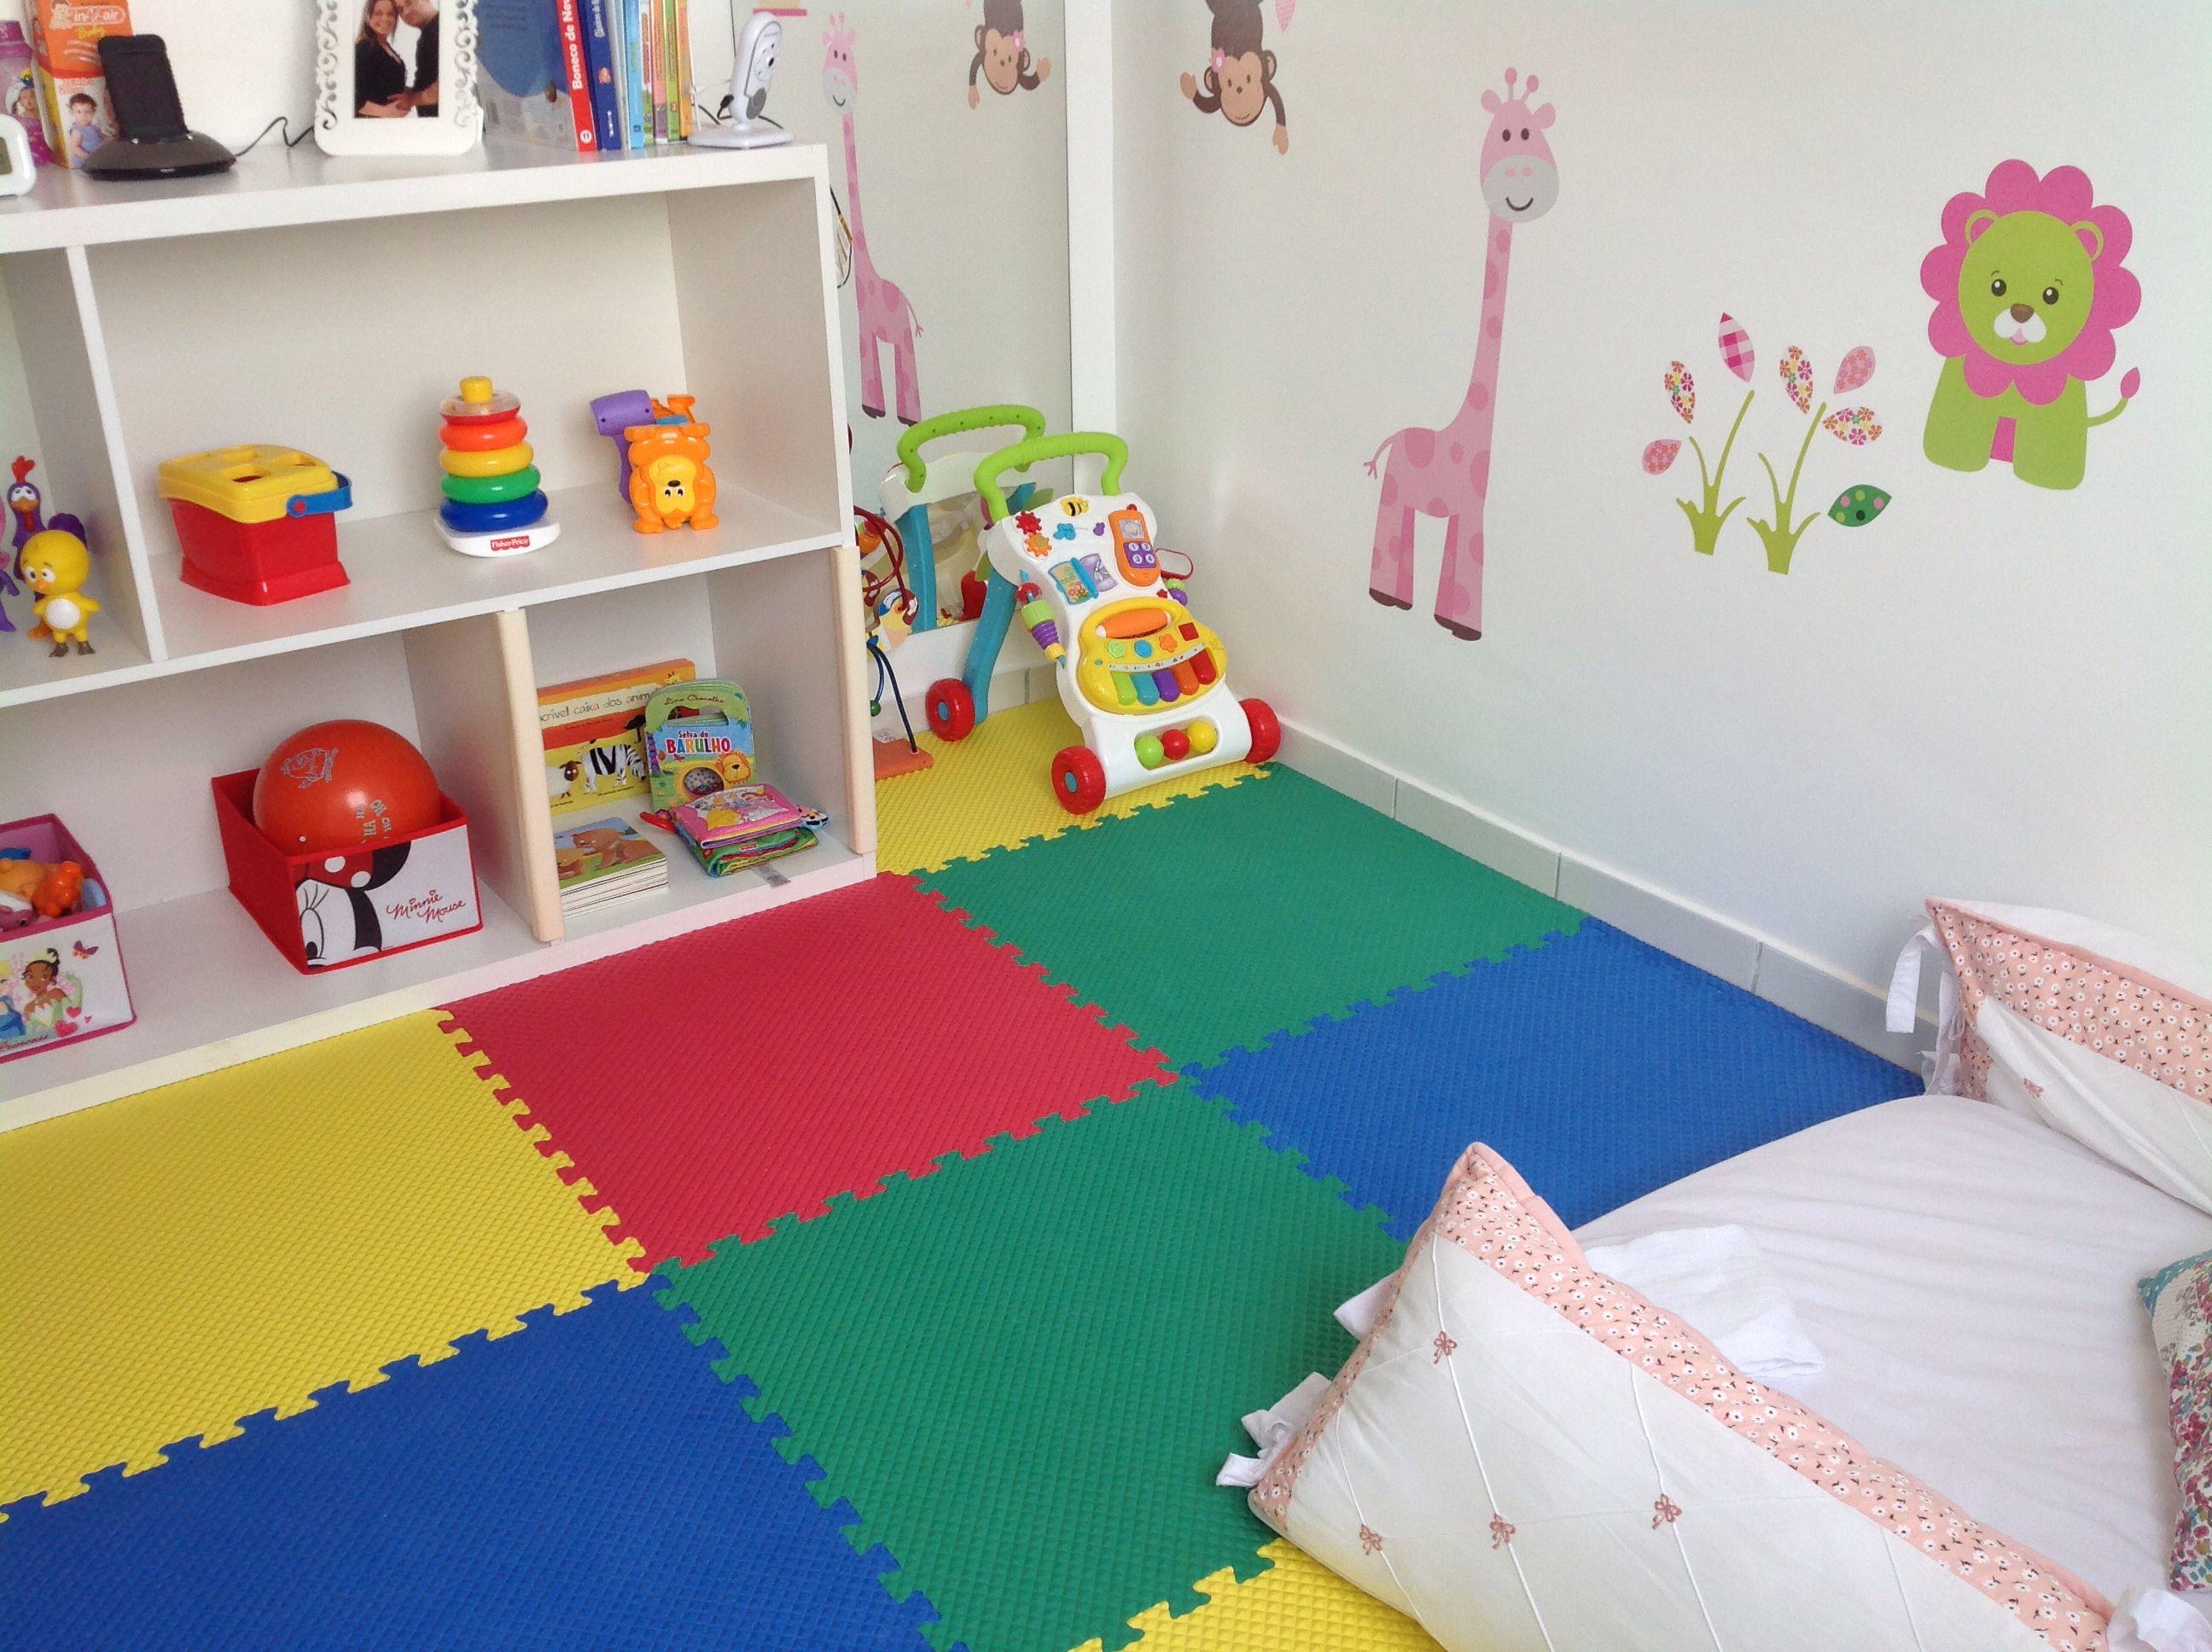 Quarto montessoriano | cosas de bebe | Pinterest | Montessori, Bebe ...